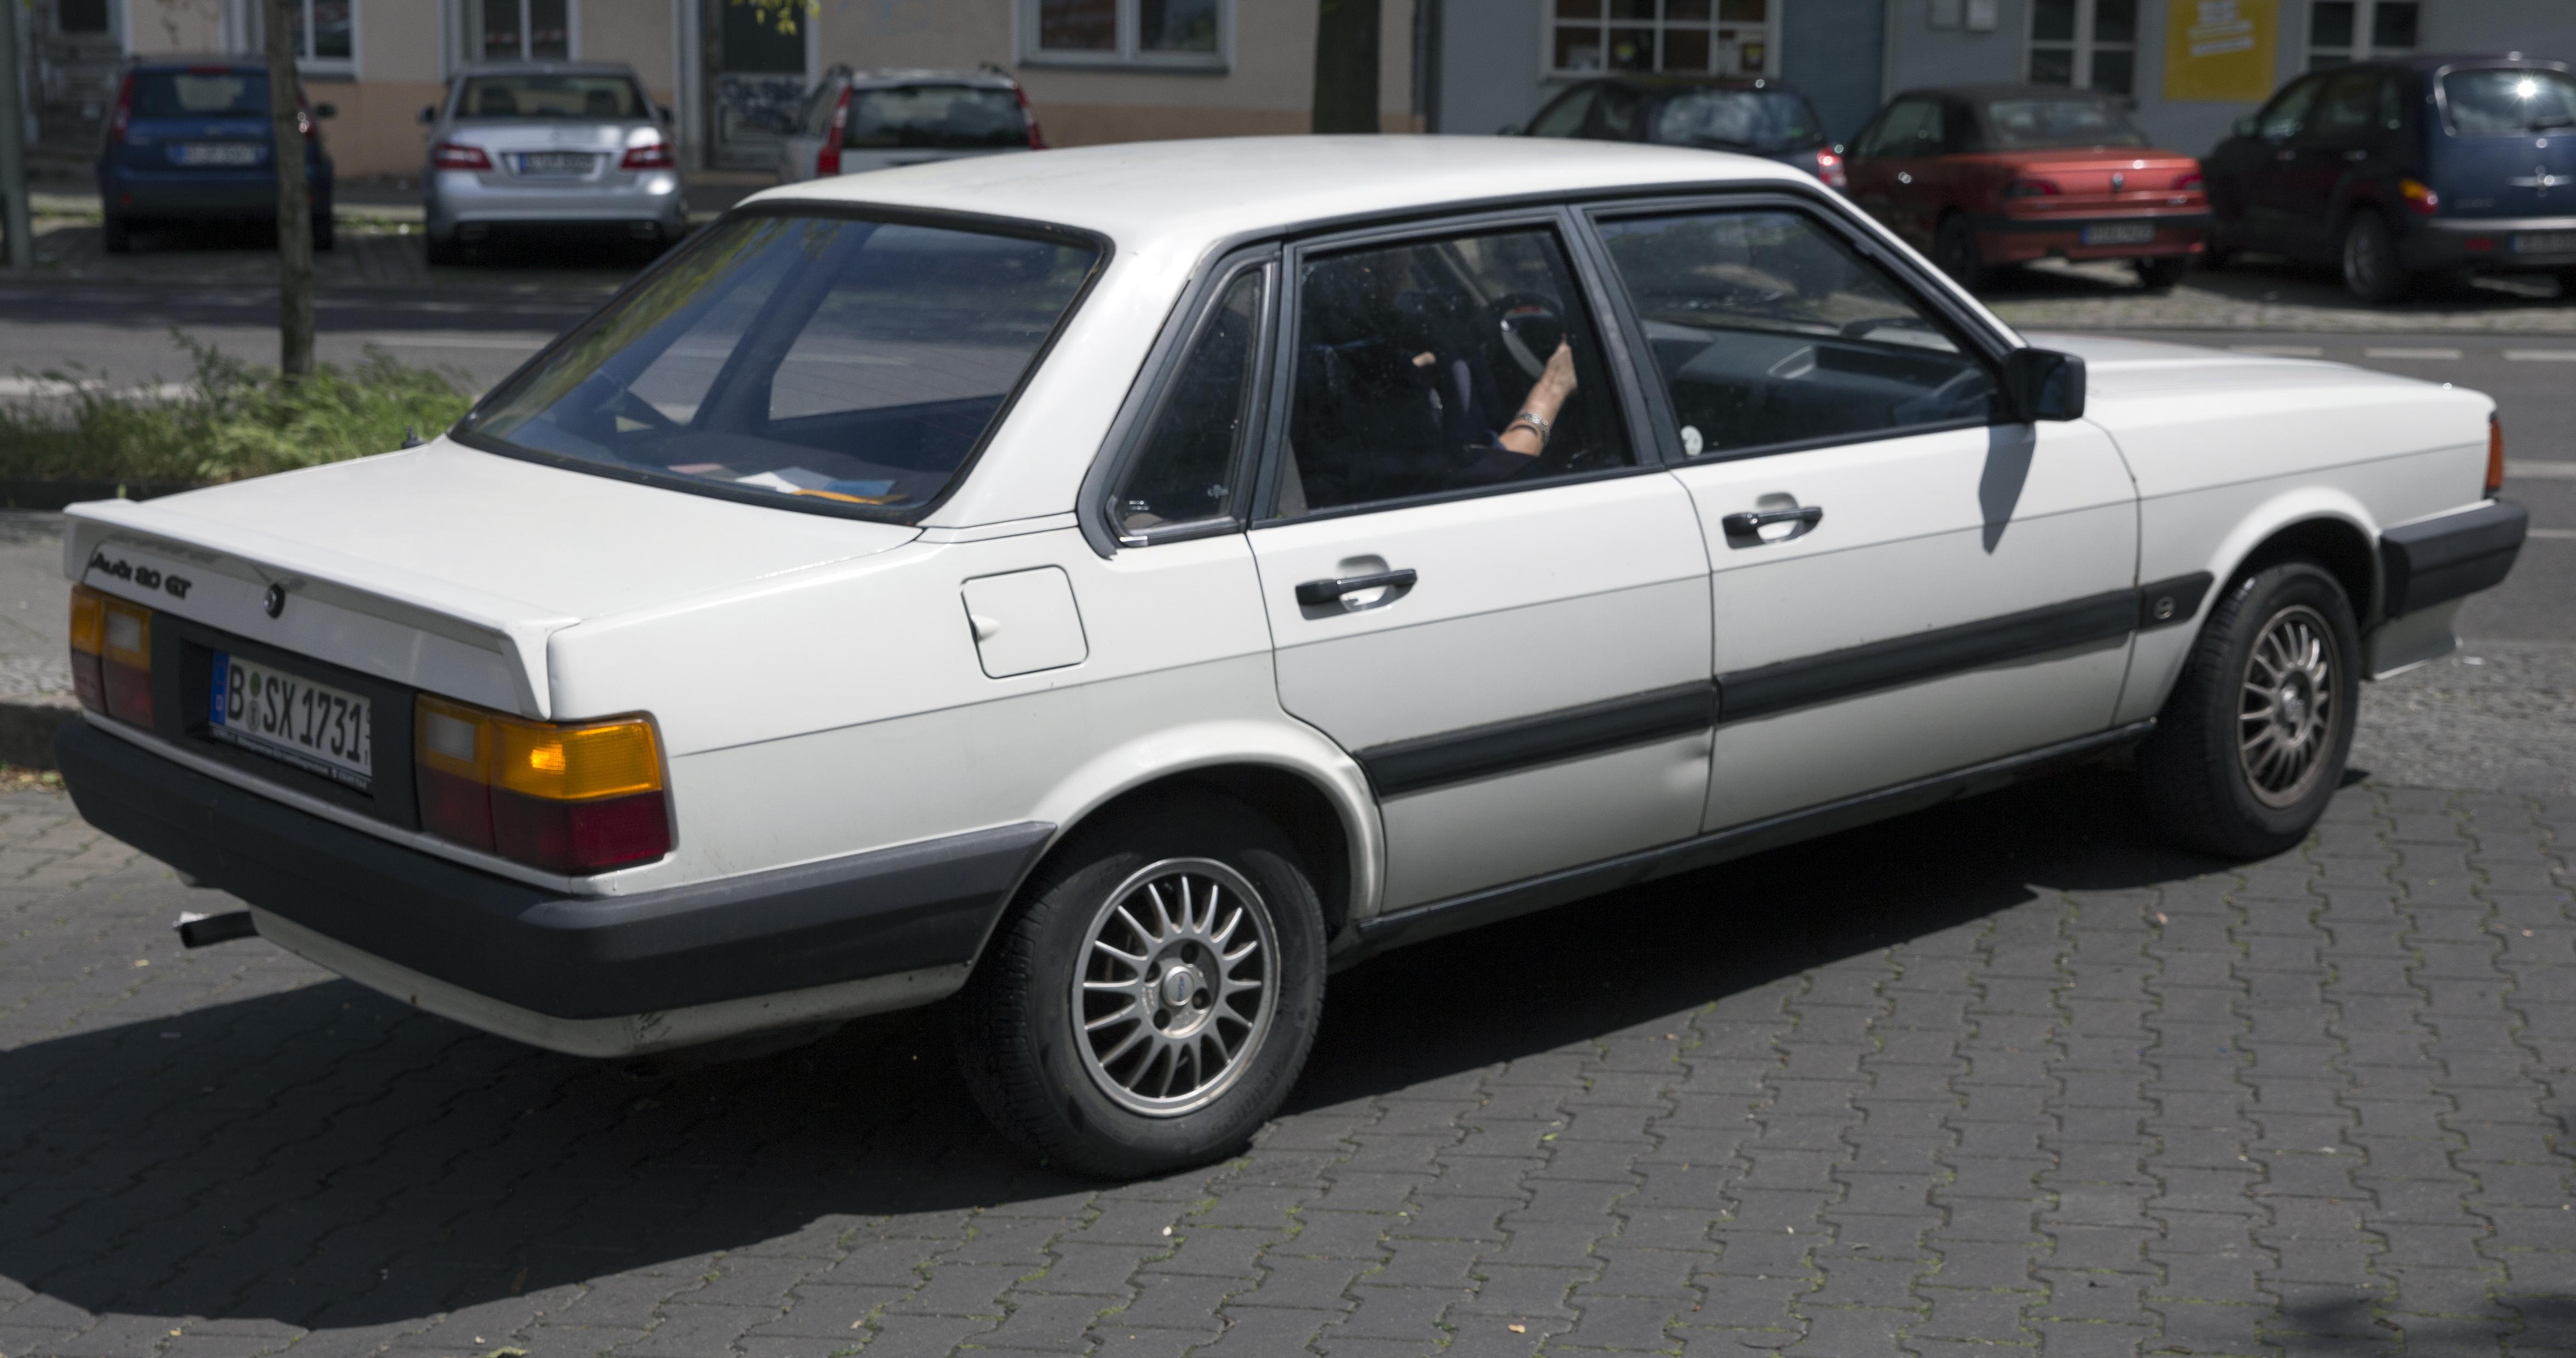 File:1986 Audi 80 GT (white), rear right.jpg - Wikimedia Commons